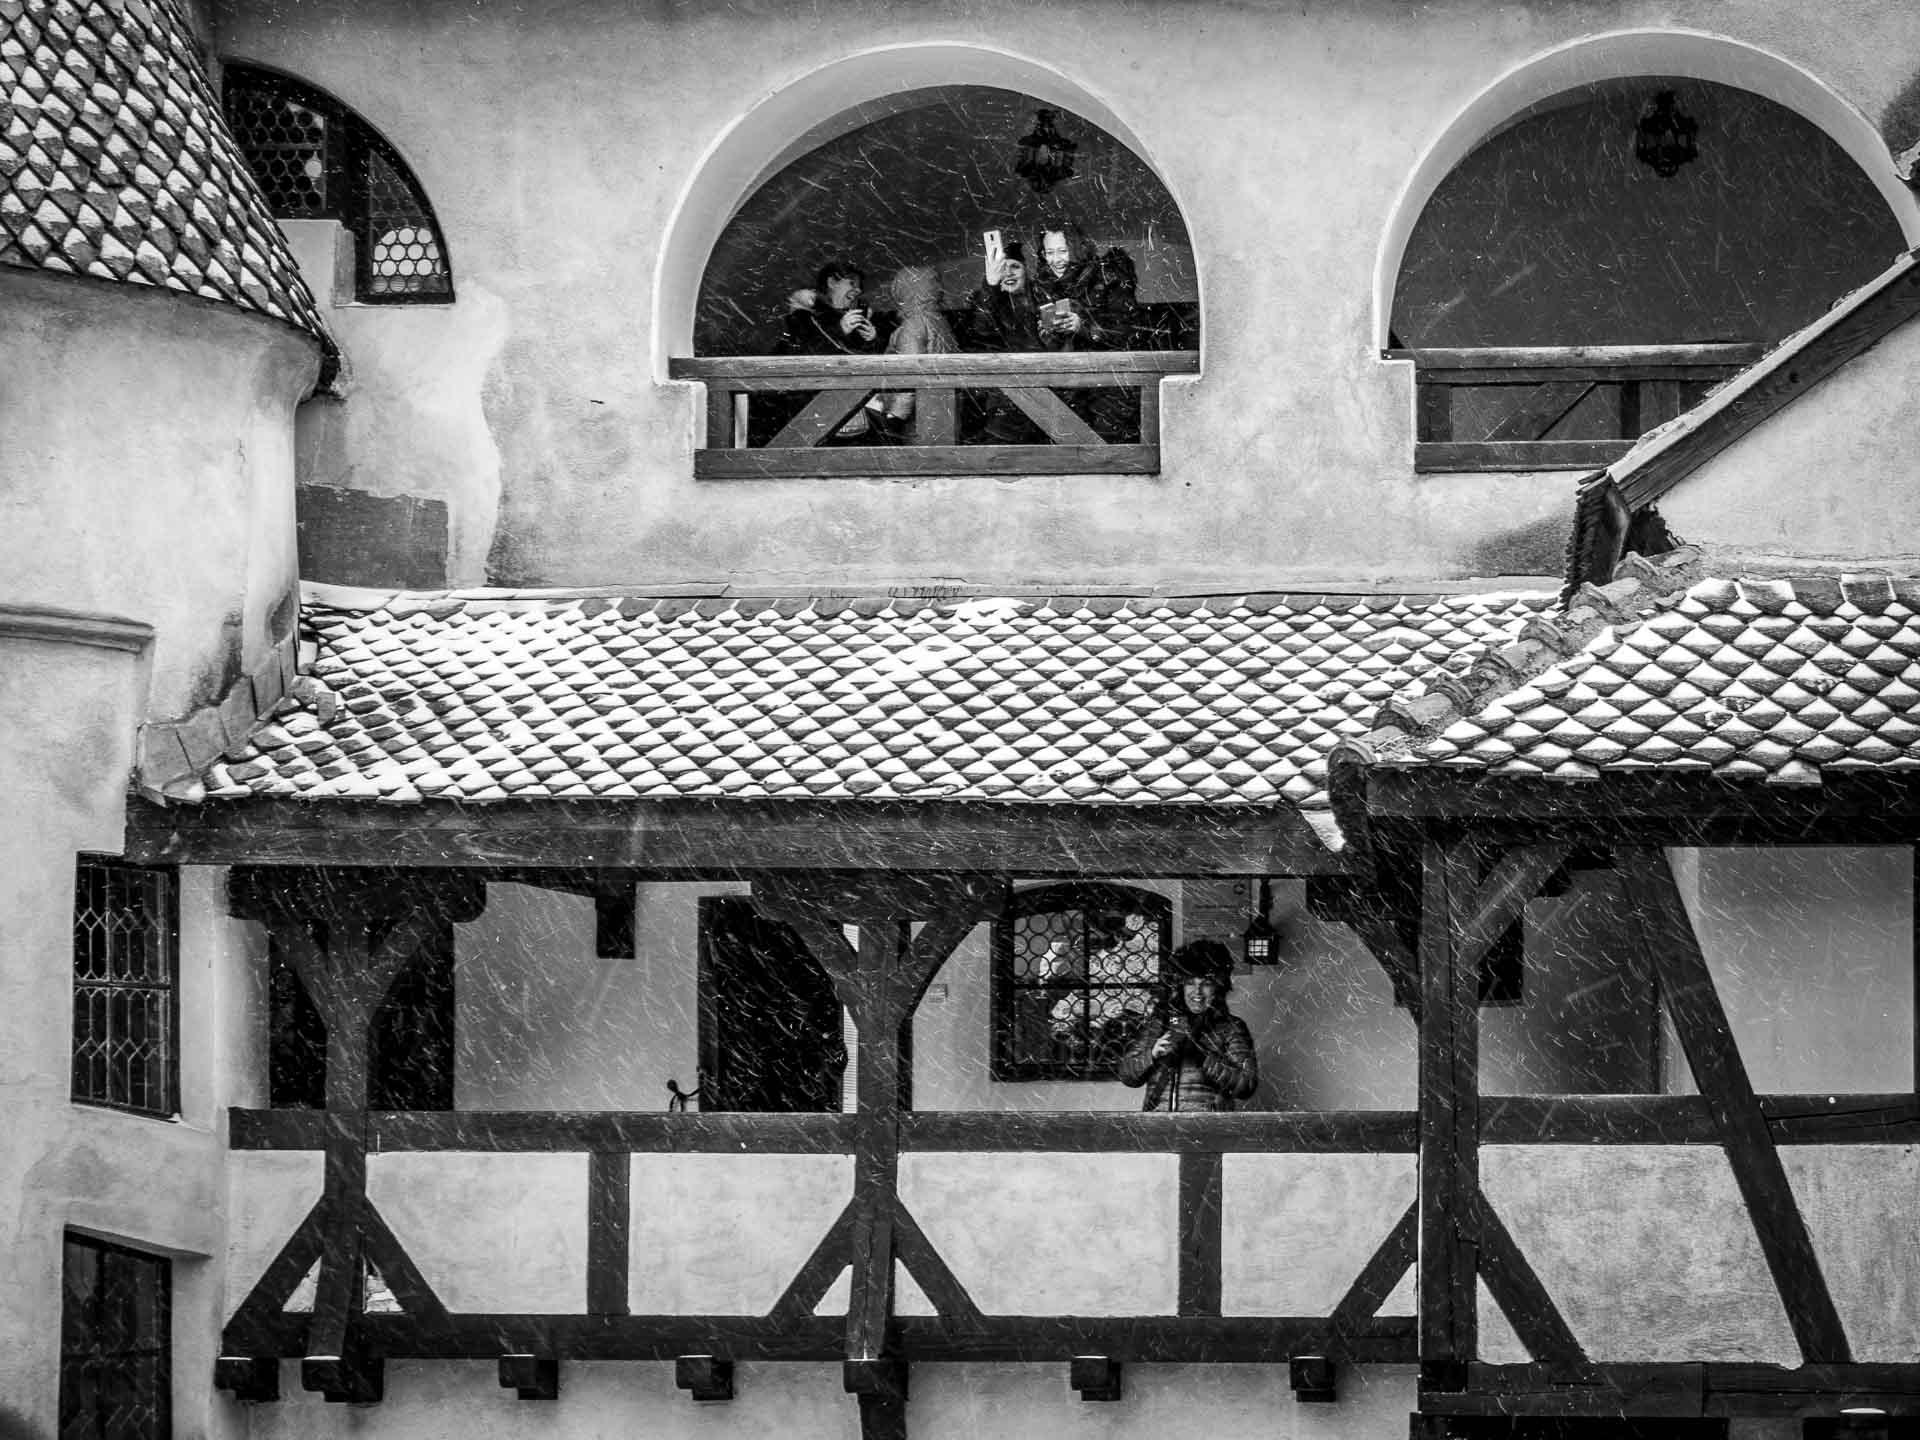 Interior courtyard of Bran Castle